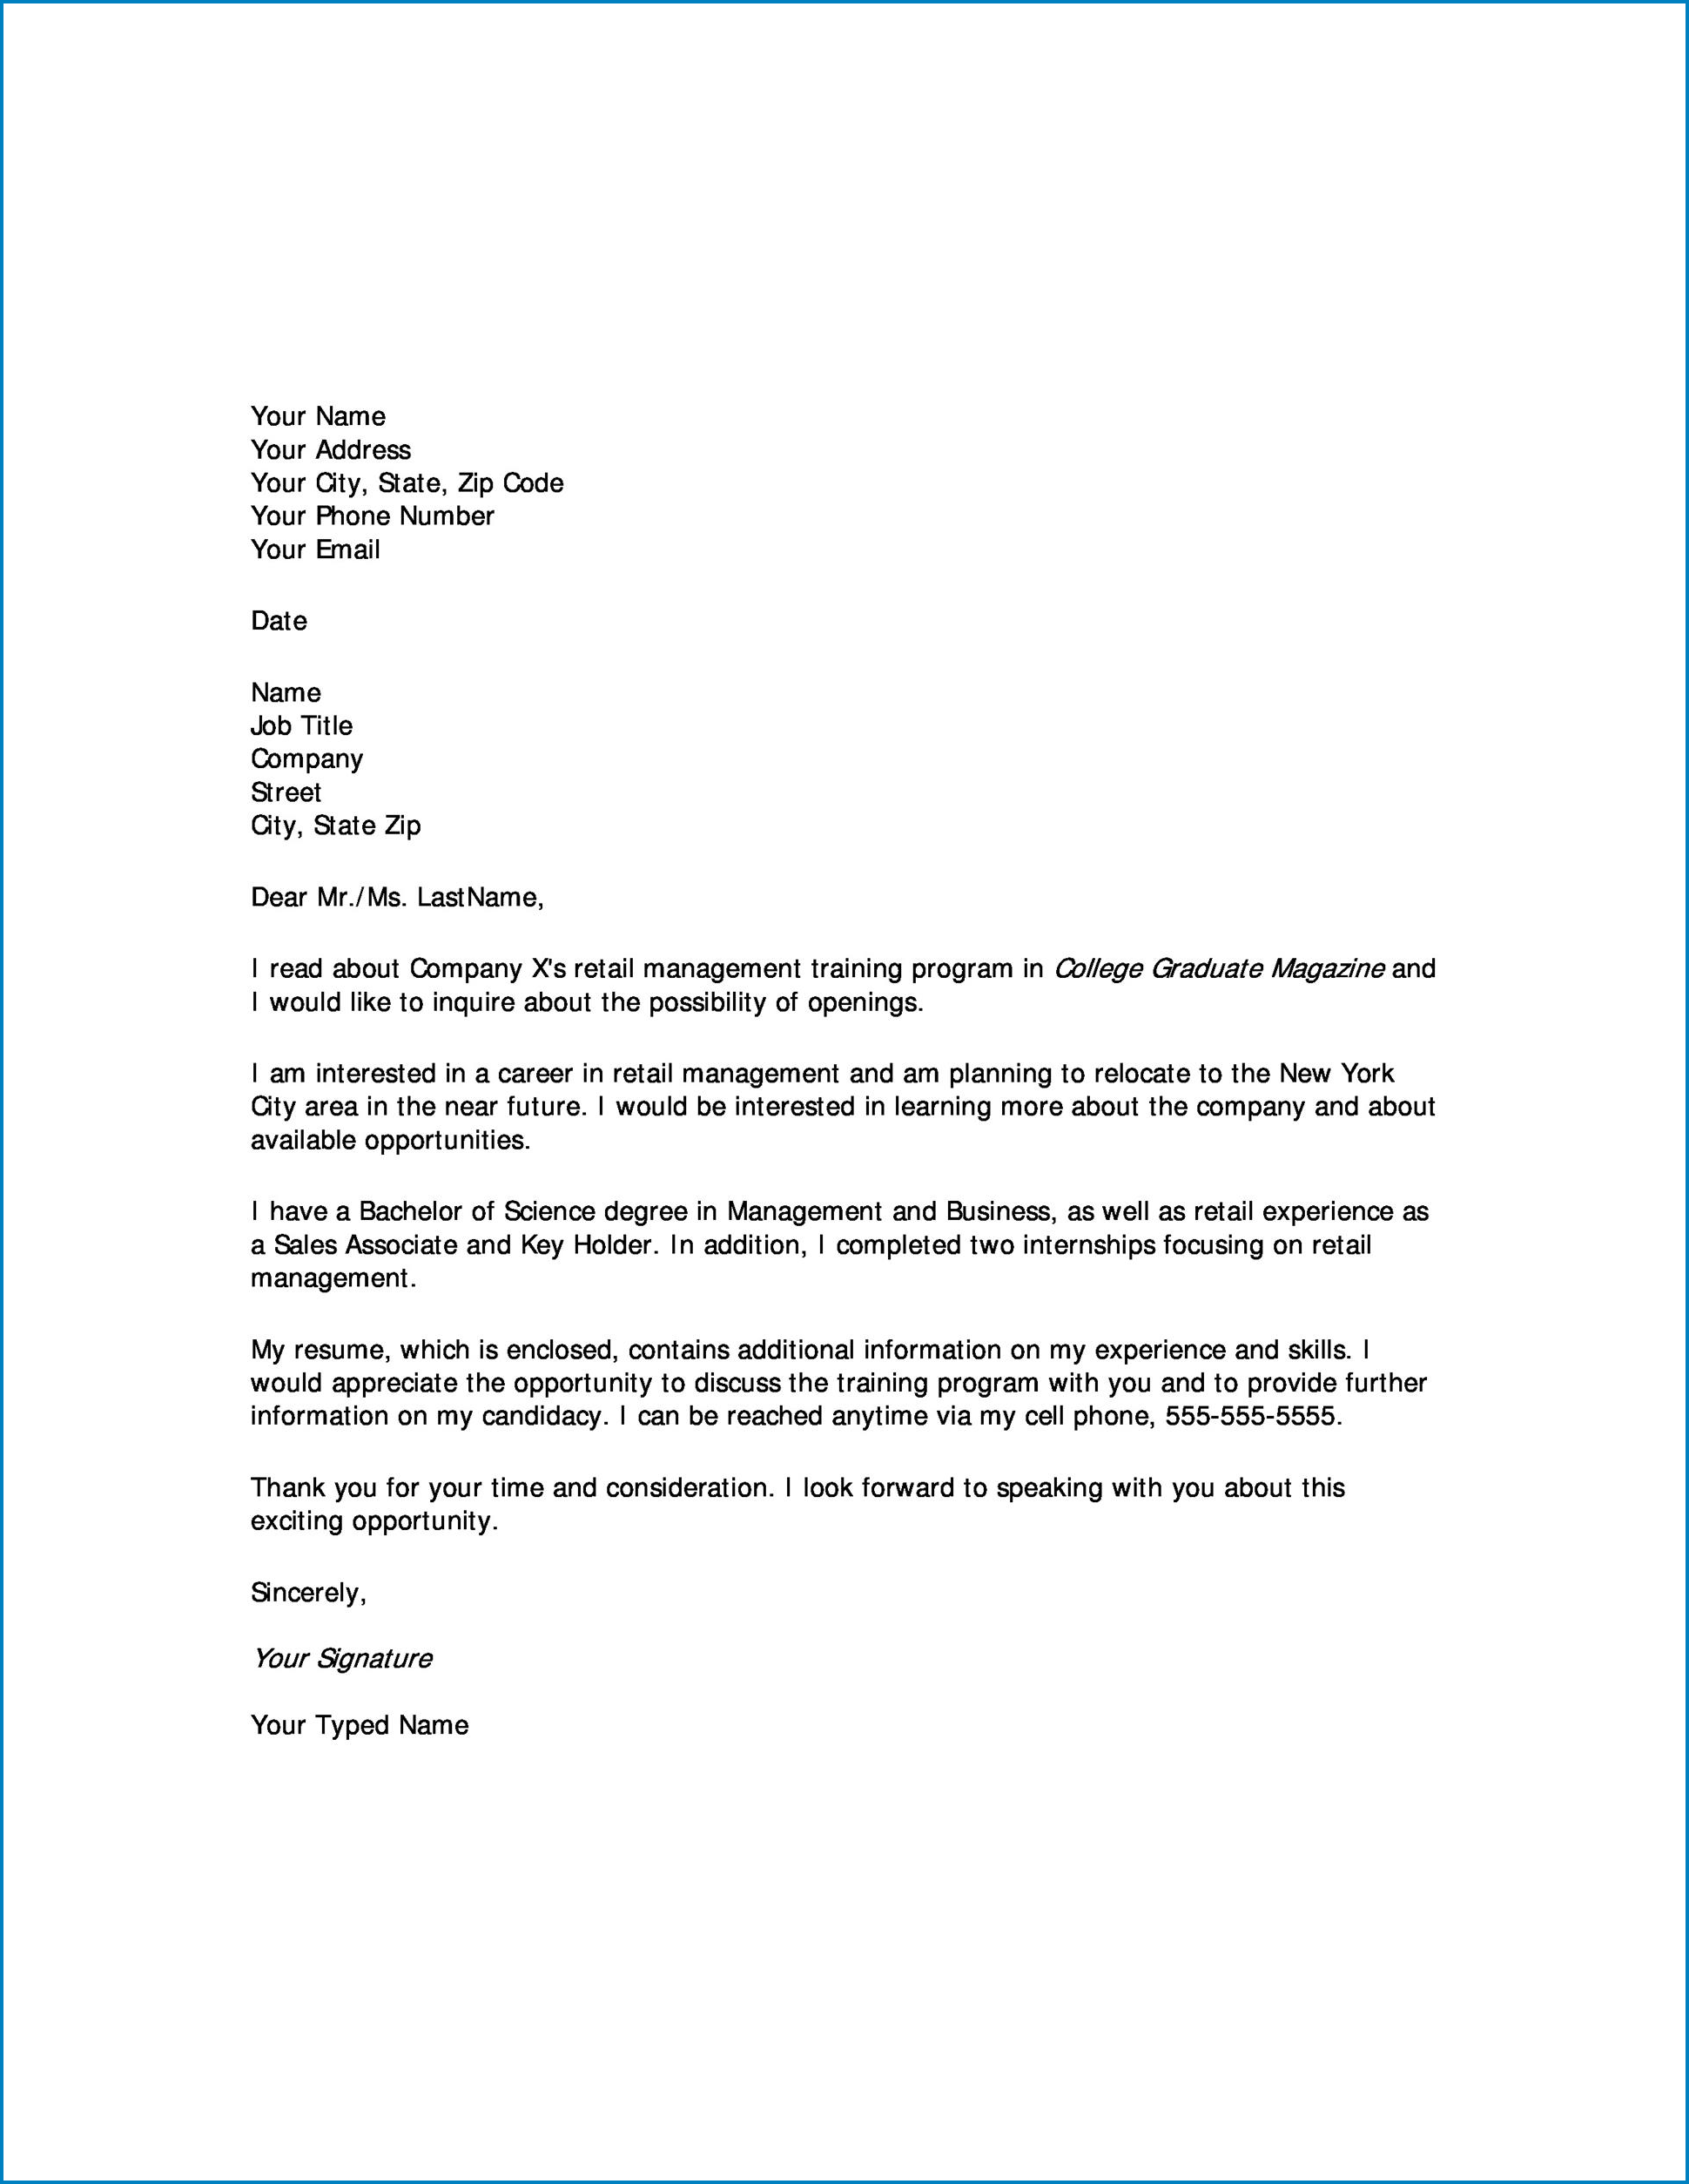 Letter Of Interest For Employment Sample